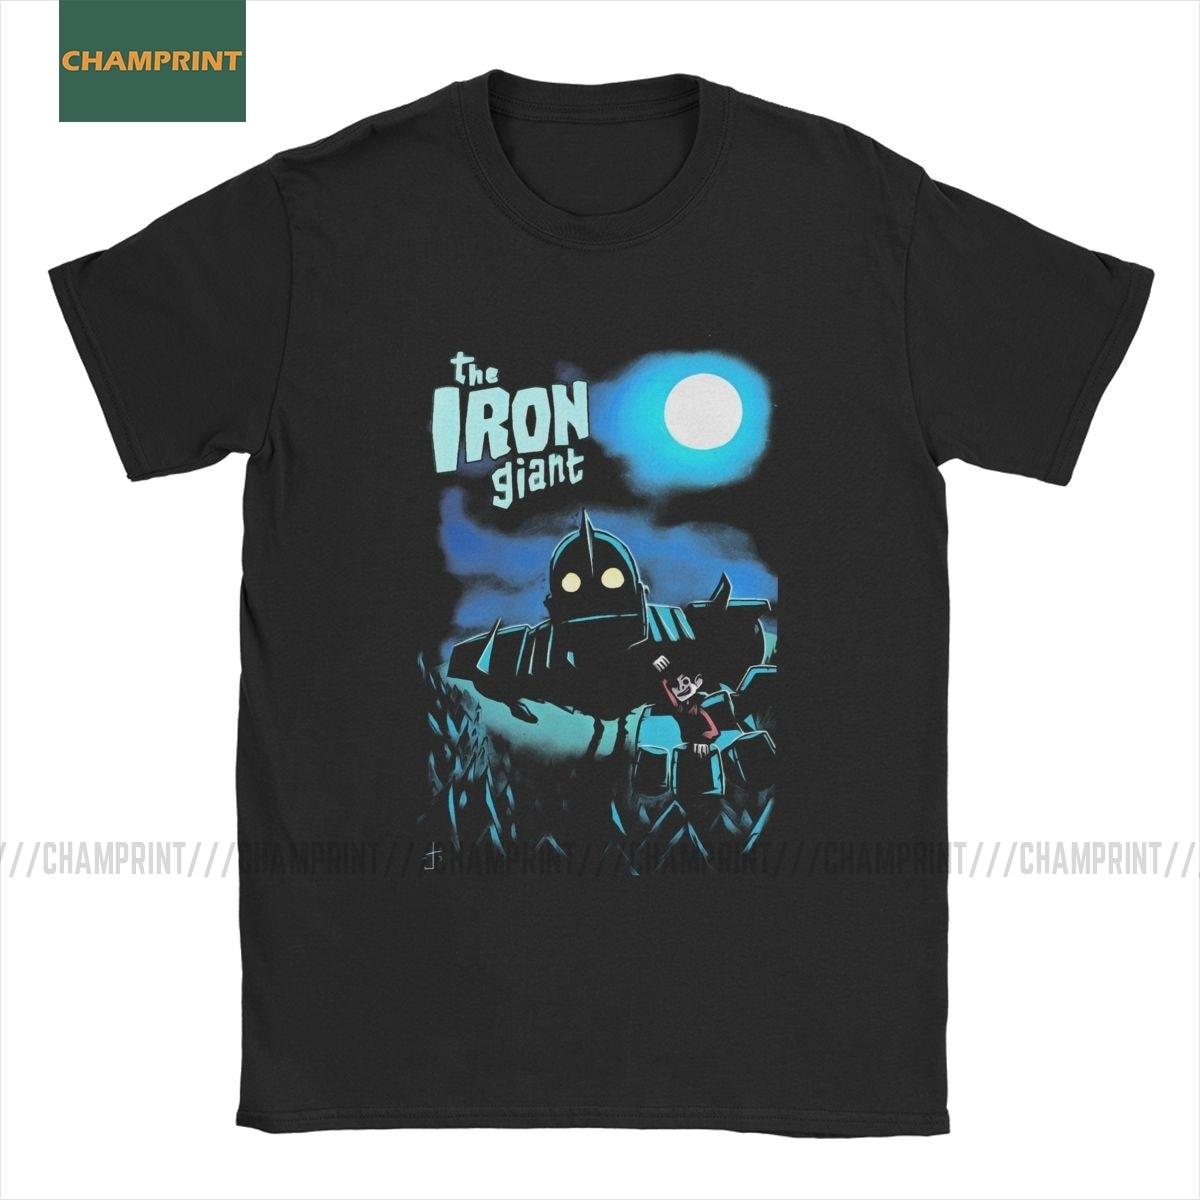 Novedad The Iron Giant Camiseta Hombre cuello redondo Algodón puro camisetas Robot animación dibujos animados Hogarth Hero camisetas de manga corta tamaño grande